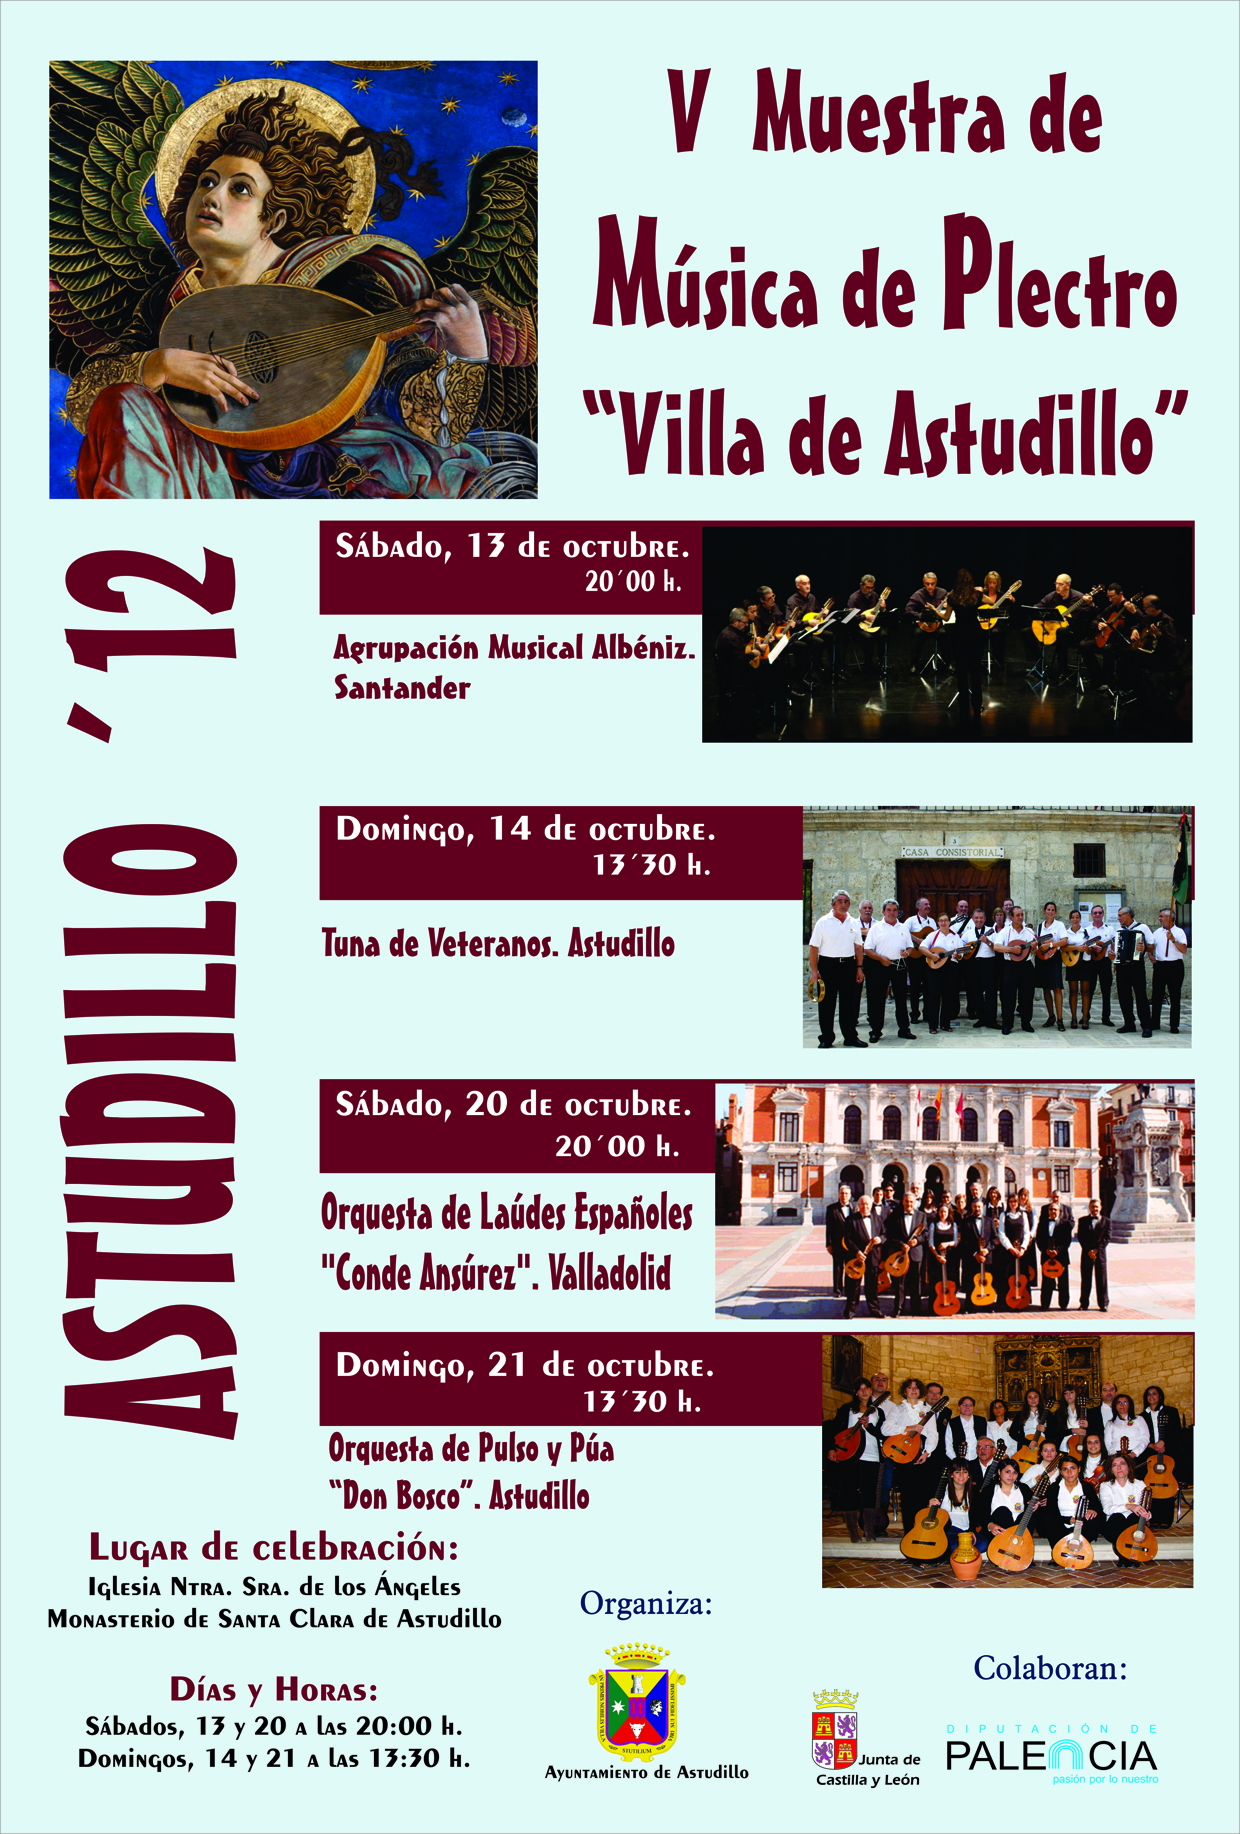 V Muestra de Música de Plectro «Villa de Astudillo»